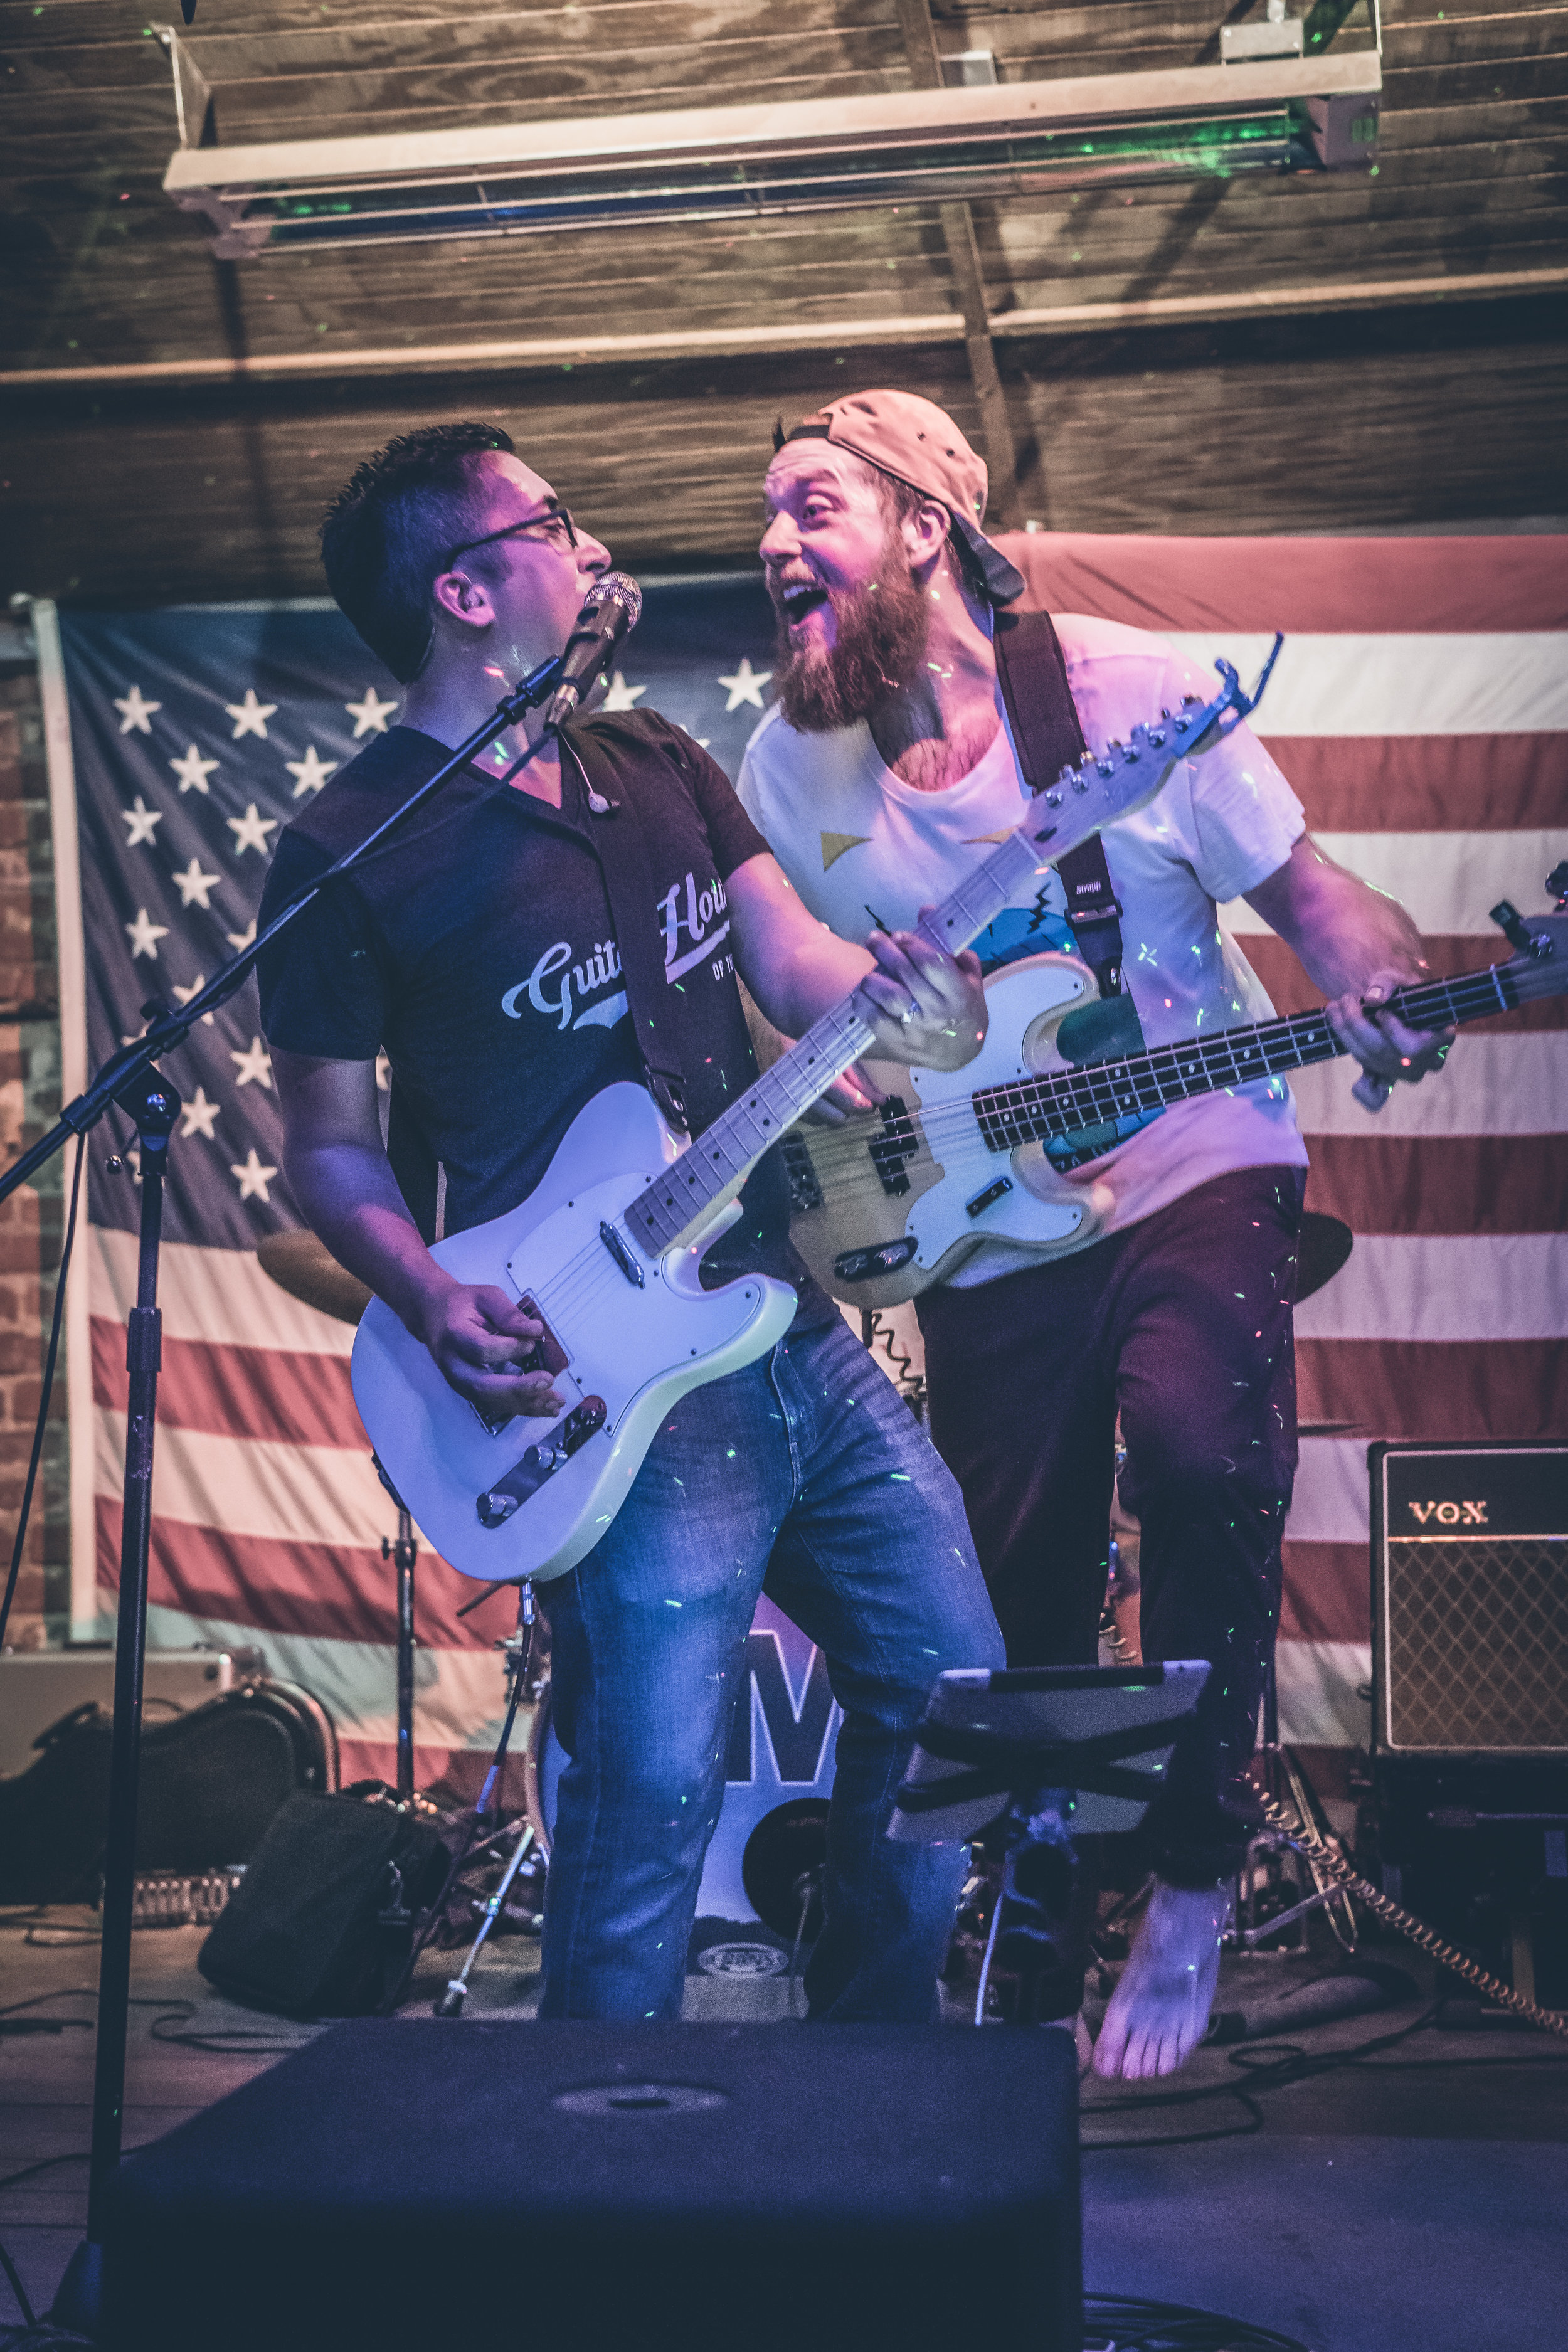 FM Pilots - Tulsa Rock Band - The Hunt Club Tulsa, OK 061016-13.jpg